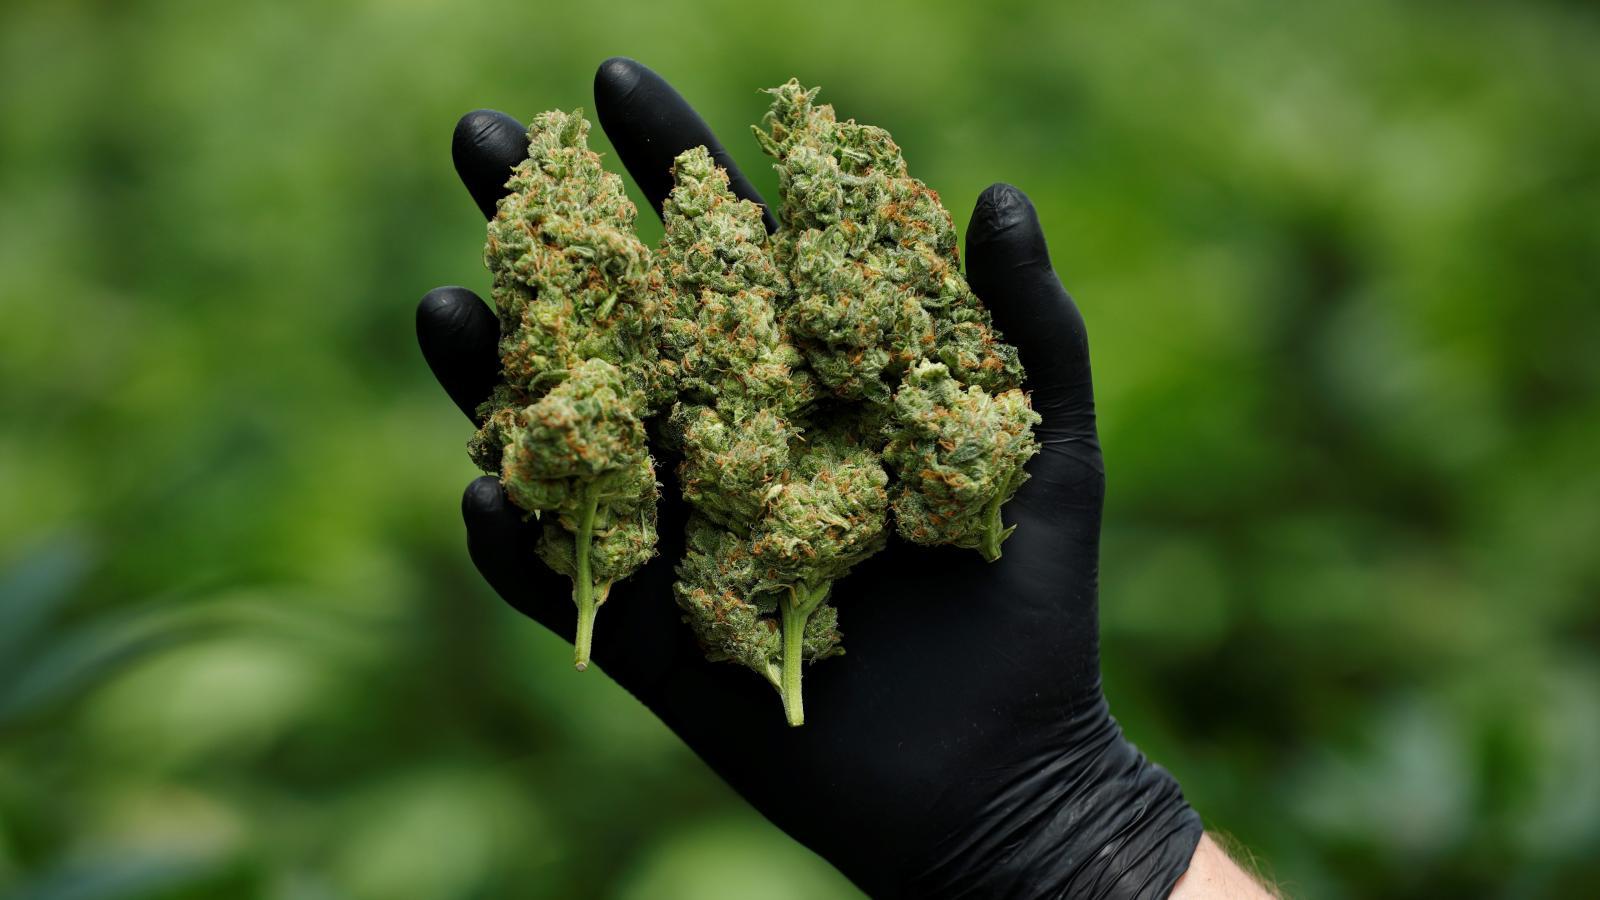 antitrust-cannabis-monopoly-e1593721551755